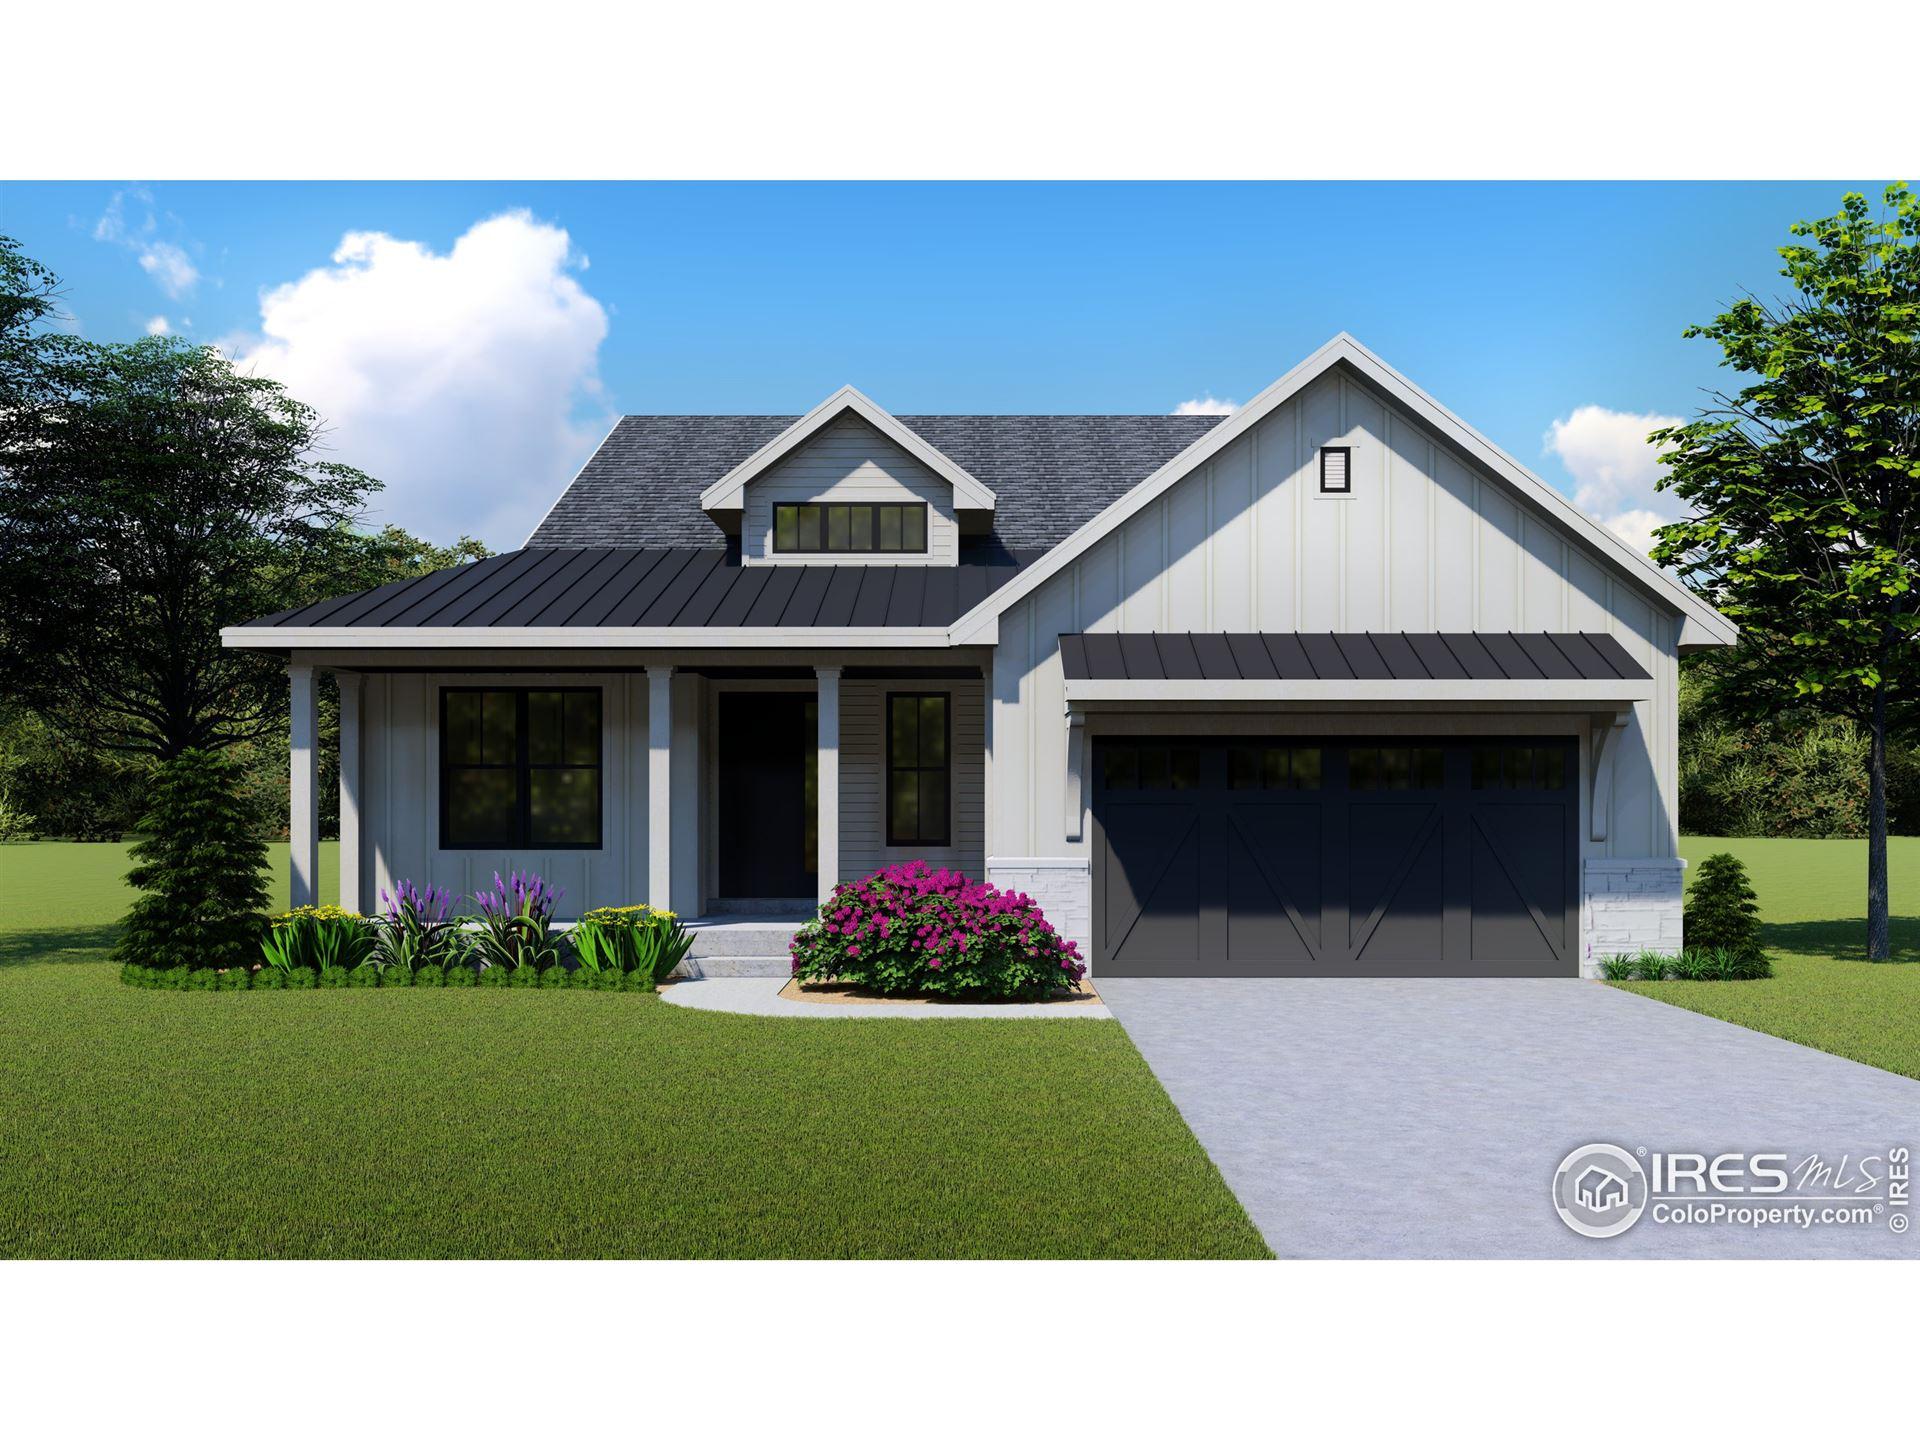 8459 Annapolis Dr, Windsor, CO 80528 - #: 940653